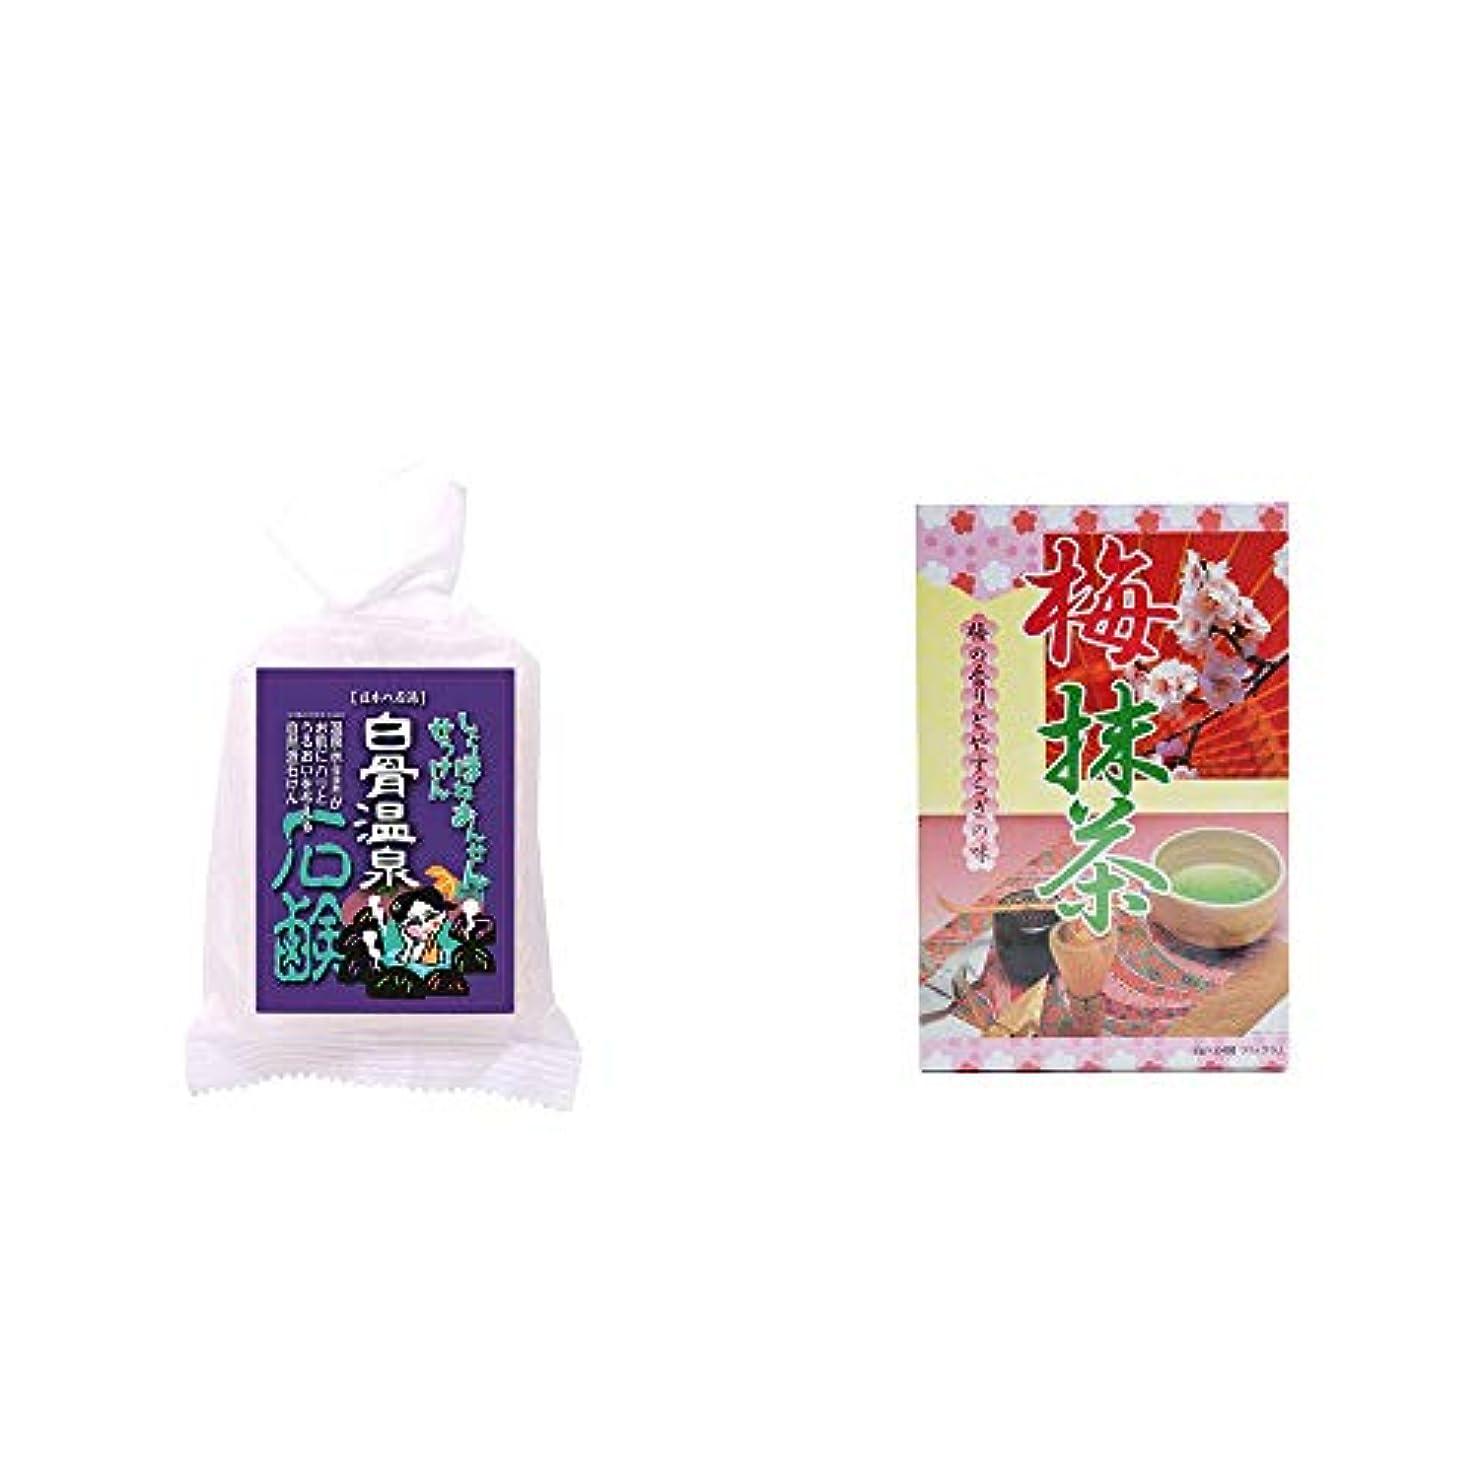 [2点セット] 信州 白骨温泉石鹸(80g)?梅抹茶[大](24袋)